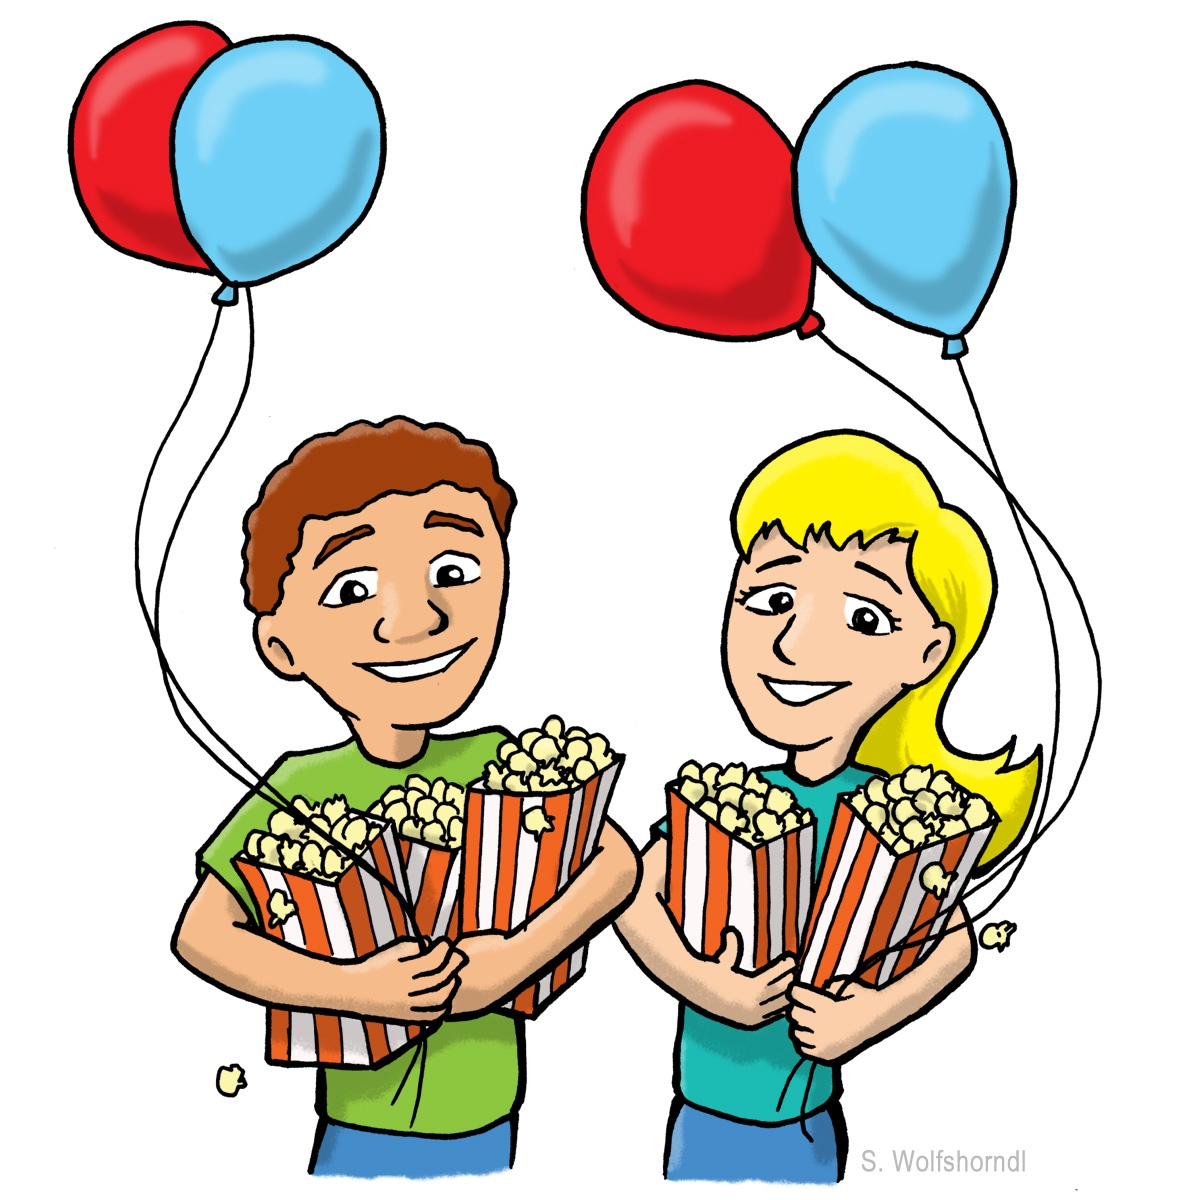 Festival clipart kids carnival Savoronmorehead Carnival Clipartion Games com